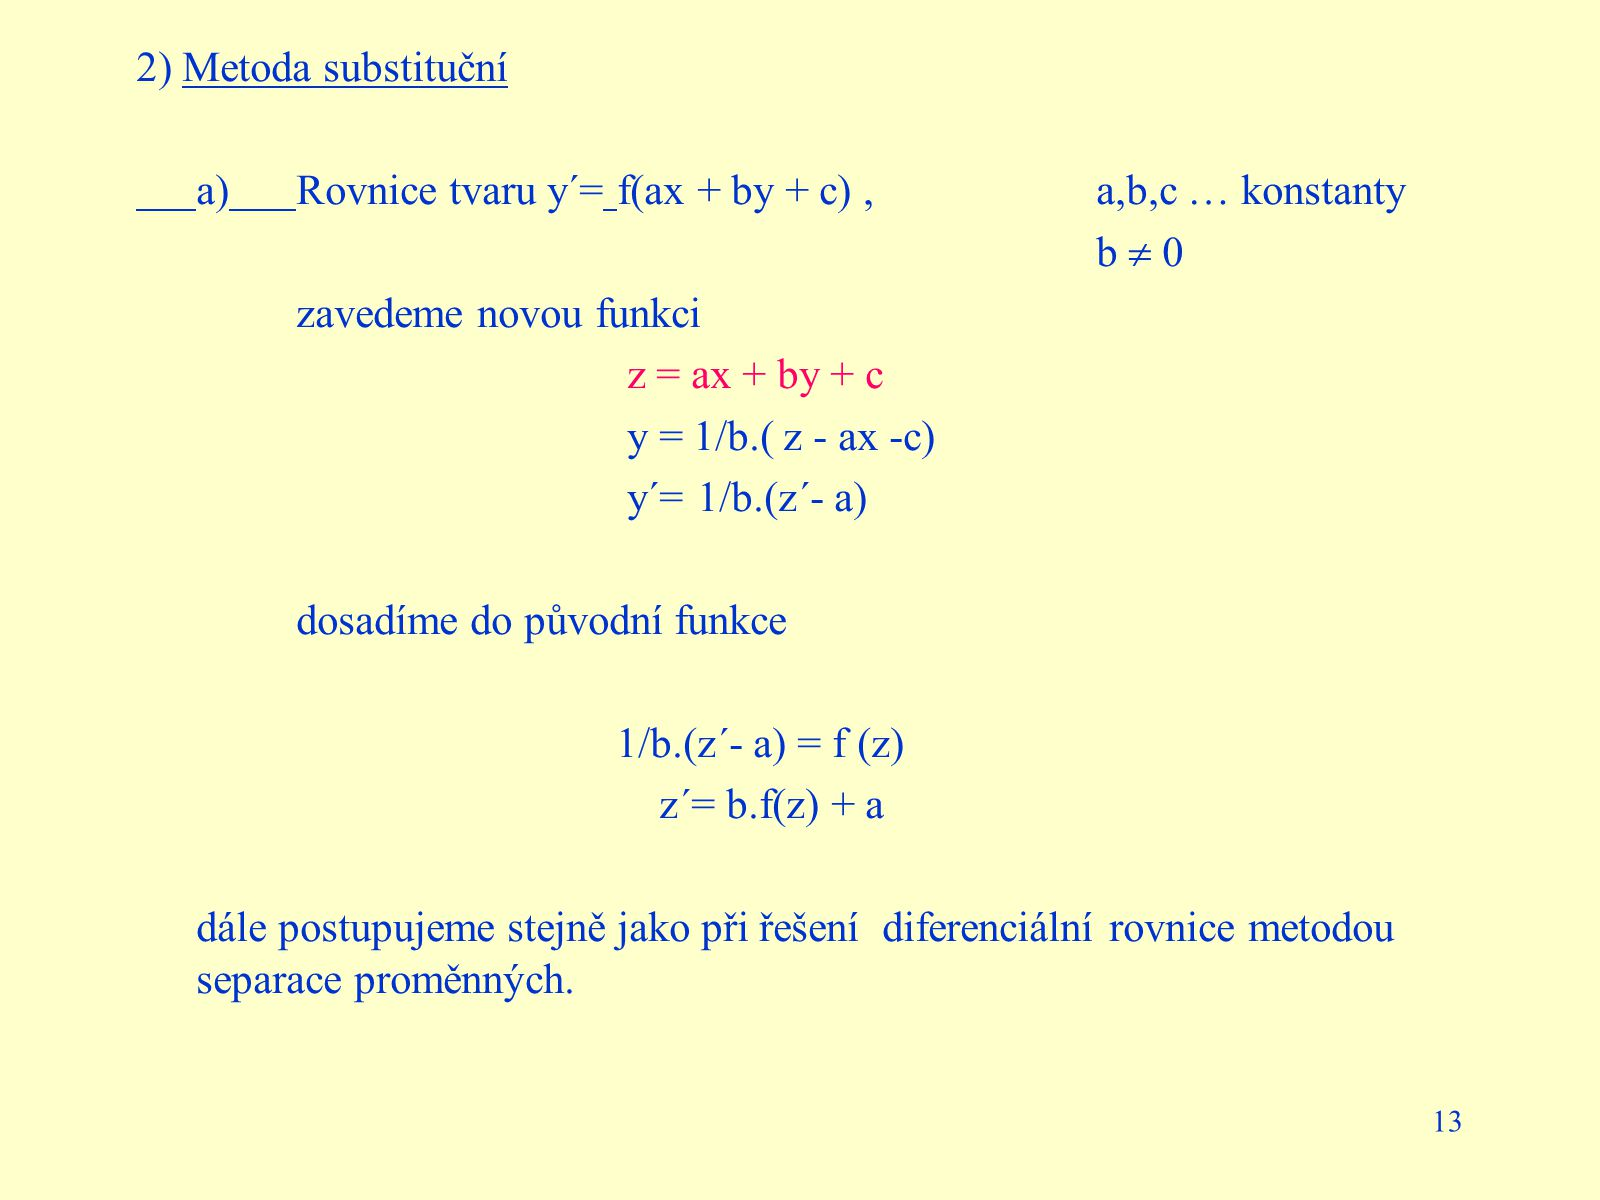 13 2) Metoda substituční a)Rovnice tvaru y´= f(ax + by + c), a,b,c … konstanty b  0 zavedeme novou funkci z = ax + by + c y = 1/b.( z - ax -c) y´= 1/